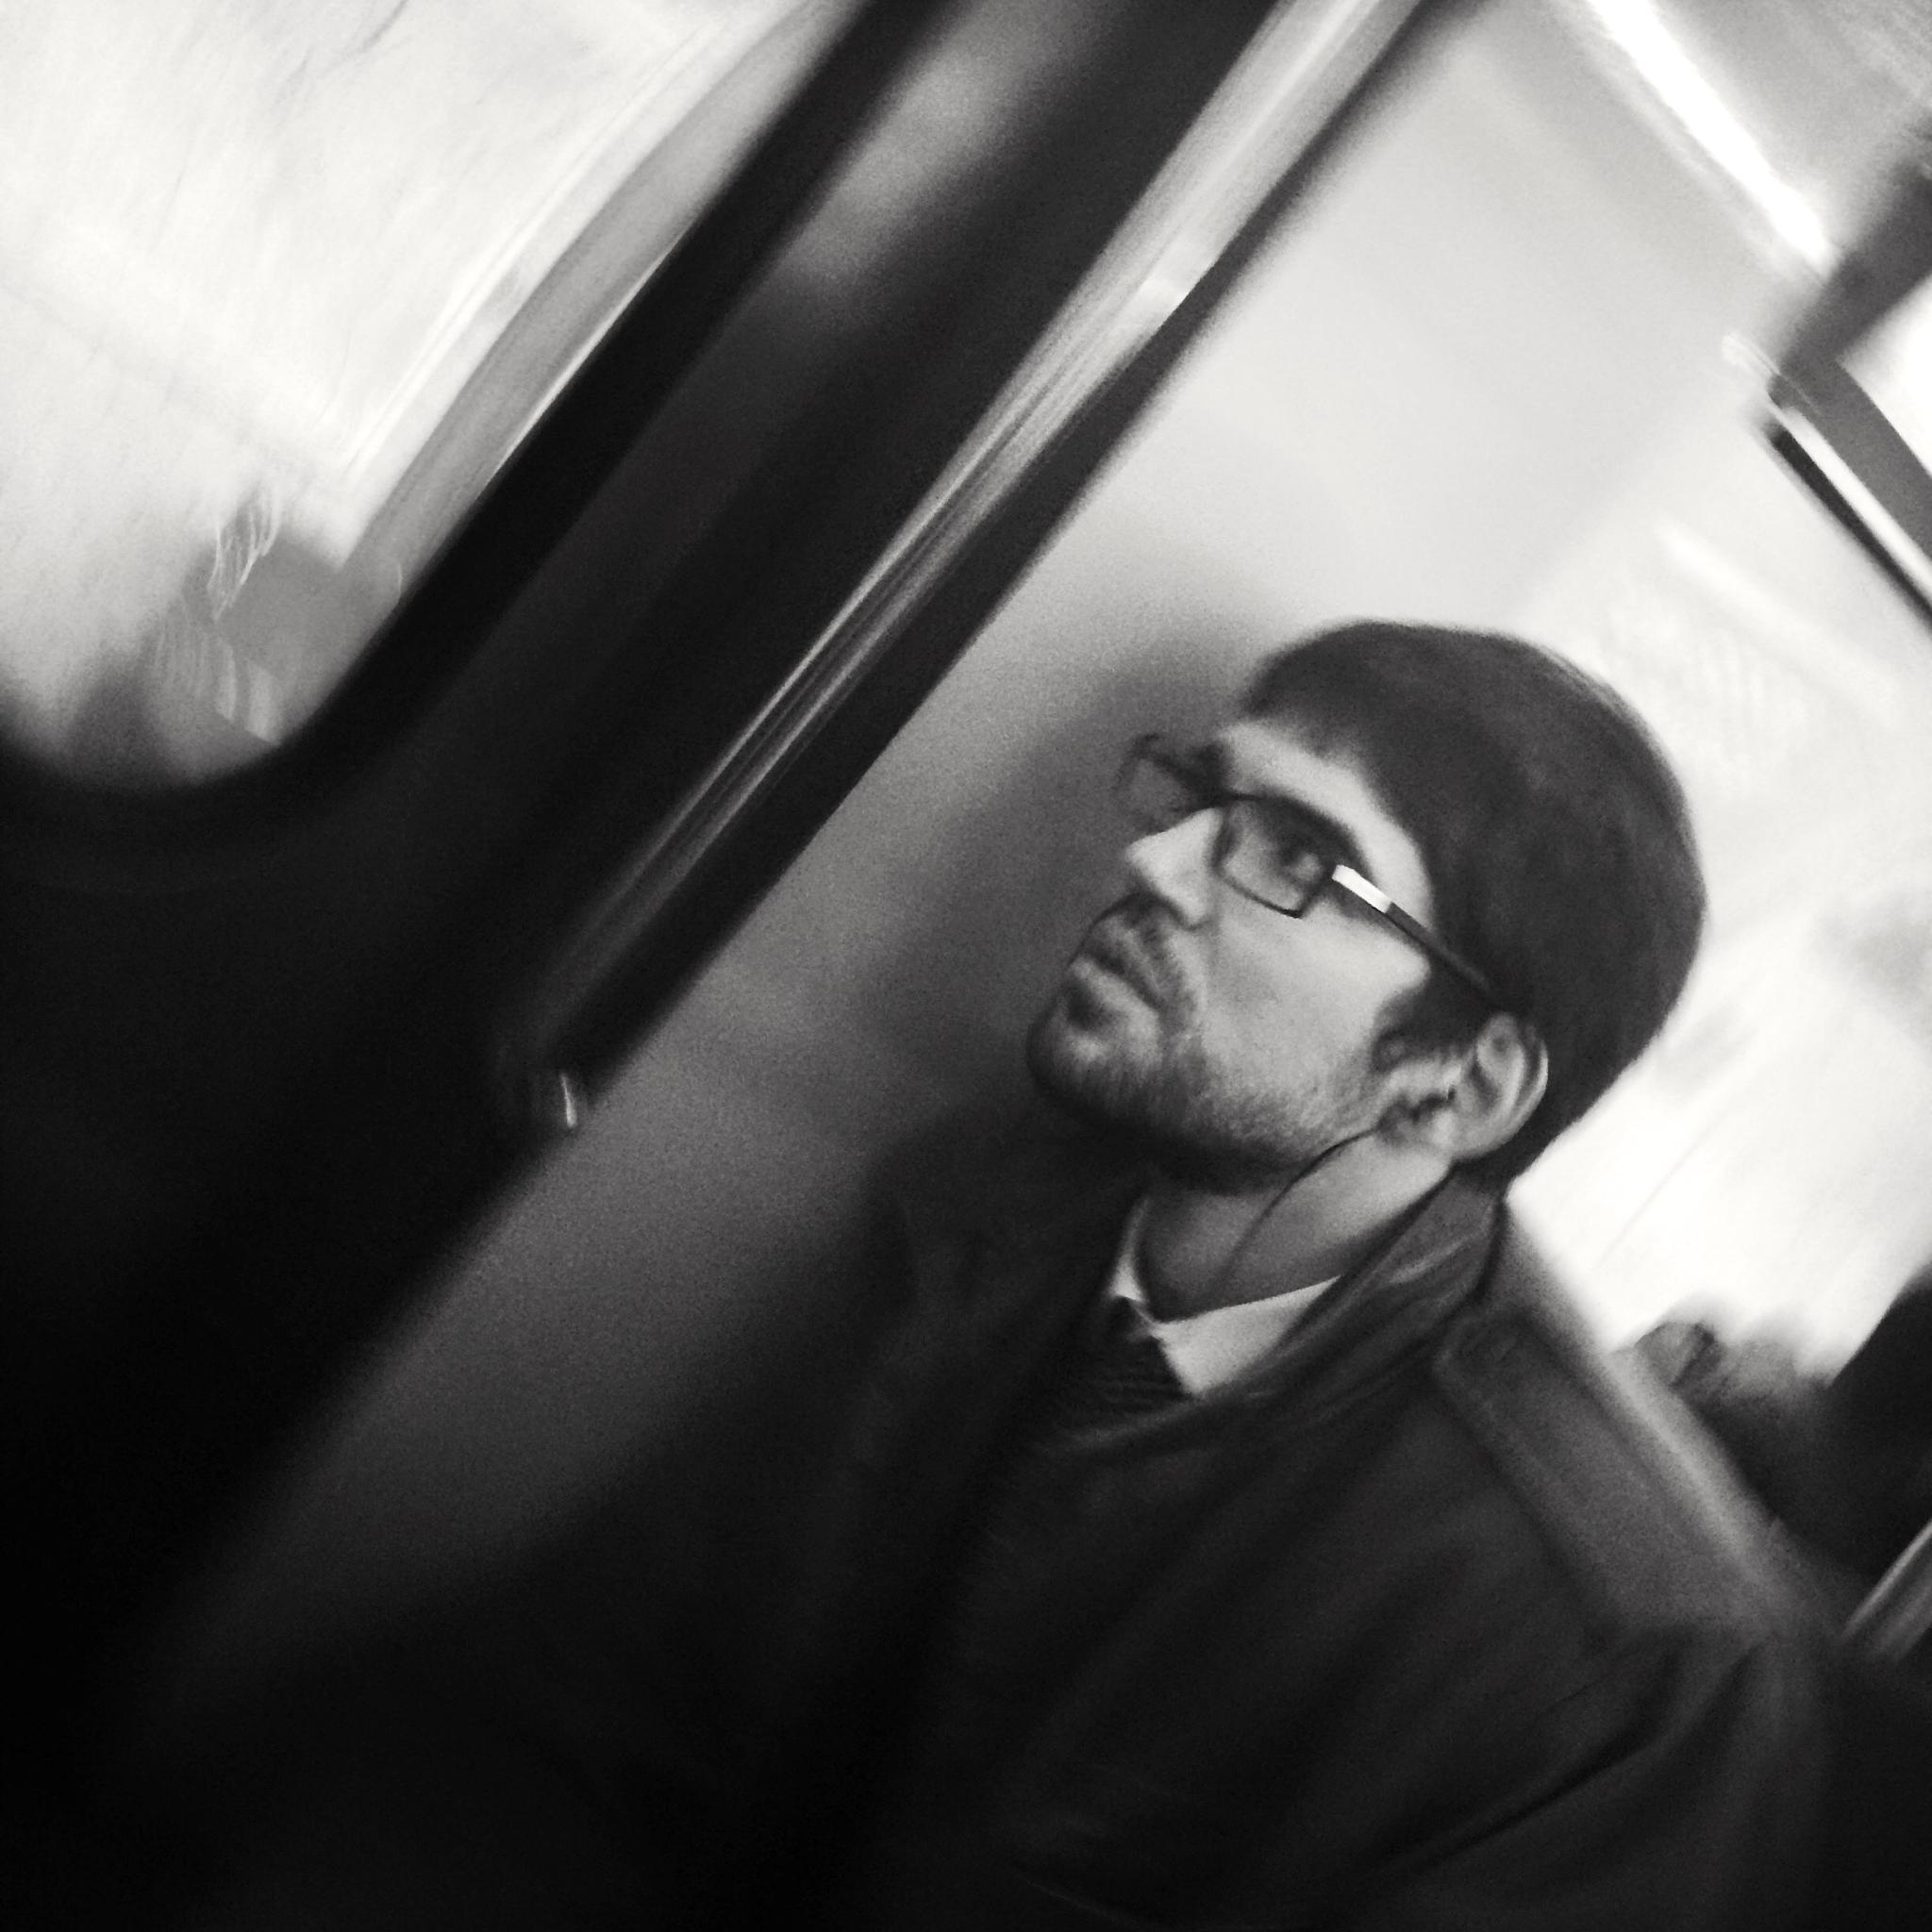 Metro portrait by parisfind